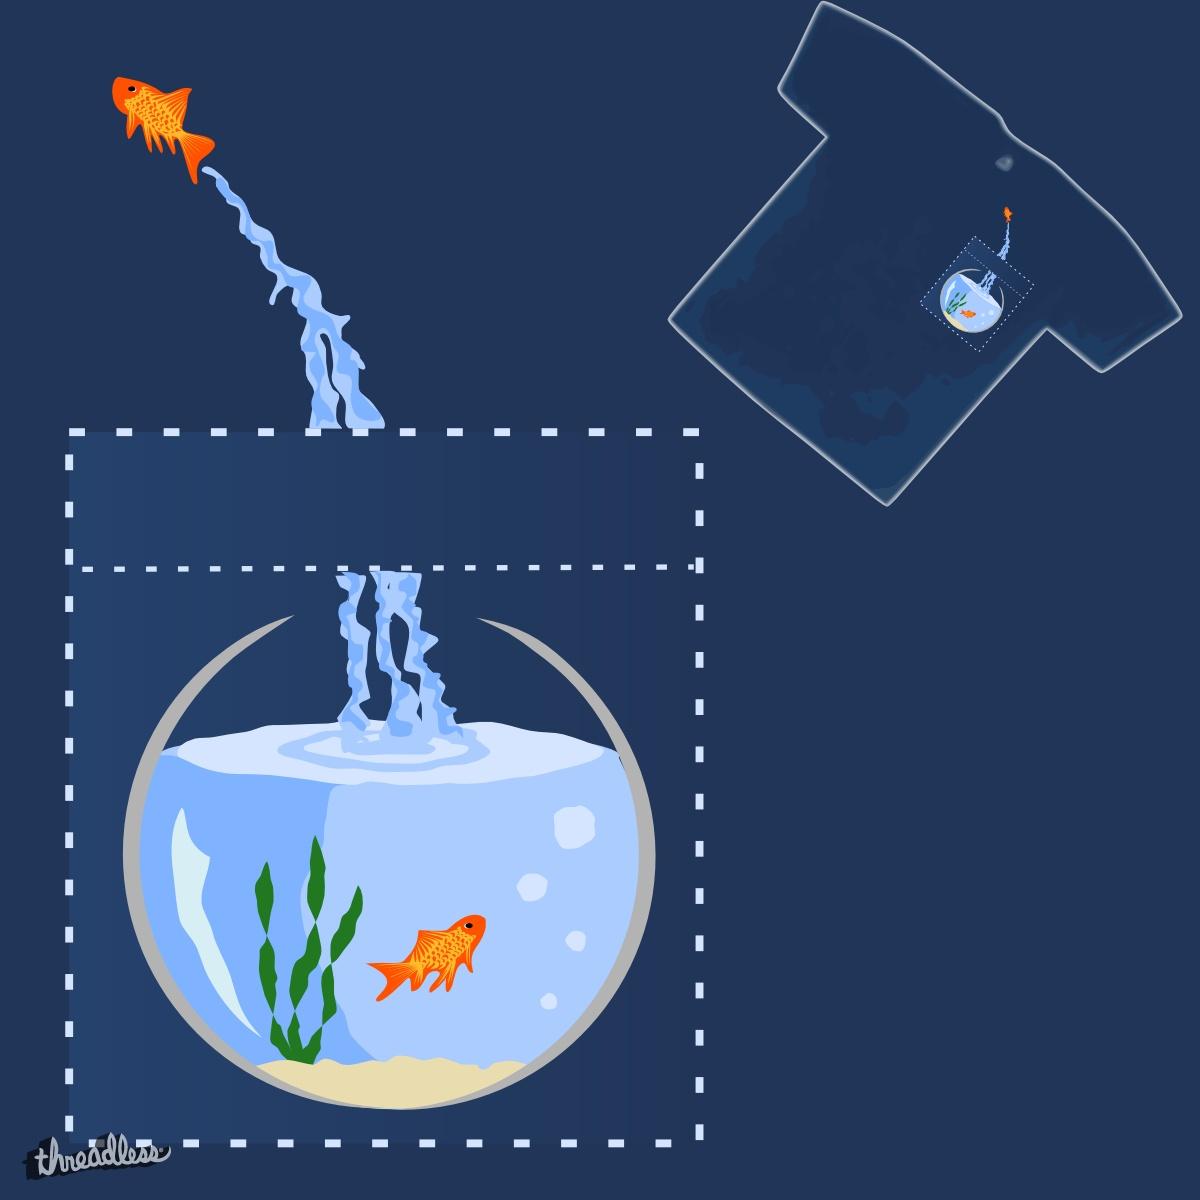 Goldfish by TRYBYK on Threadless